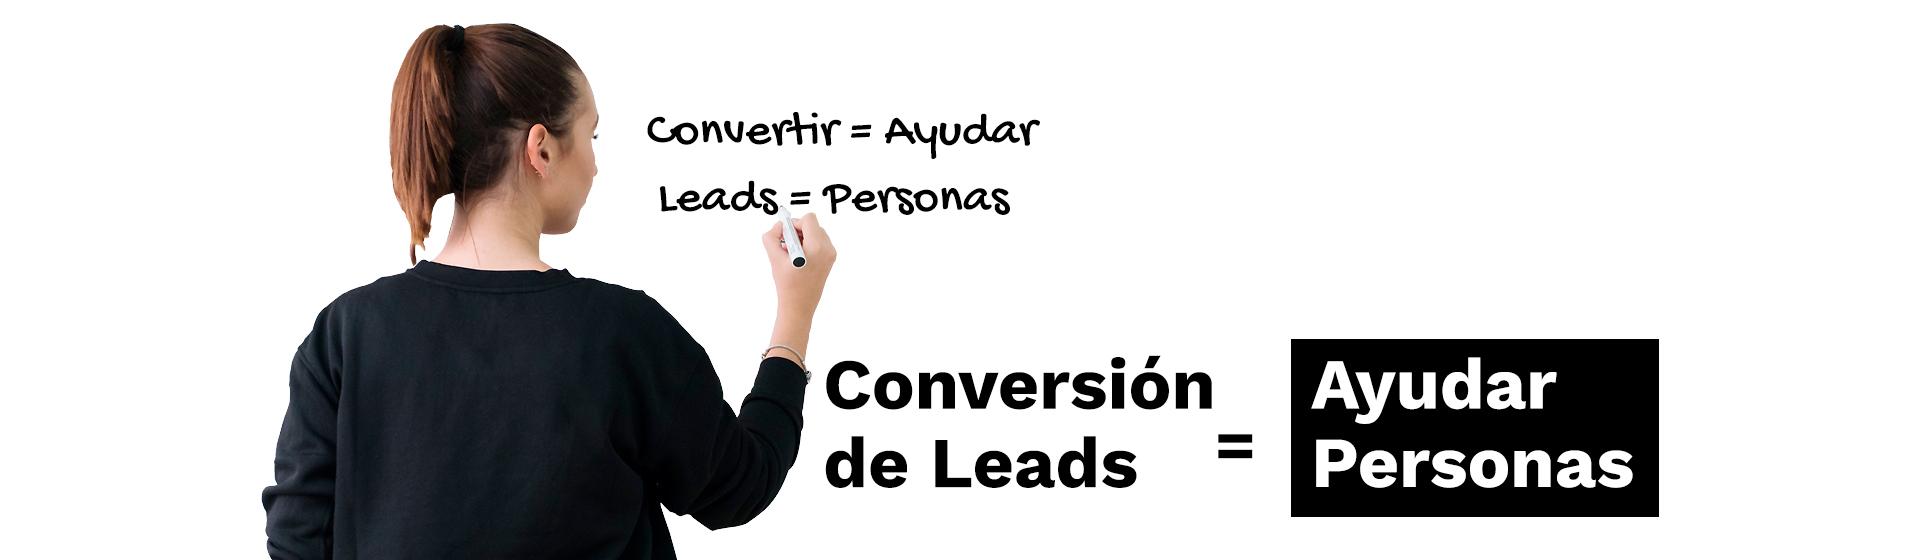 conversion-leads-cliento-banner